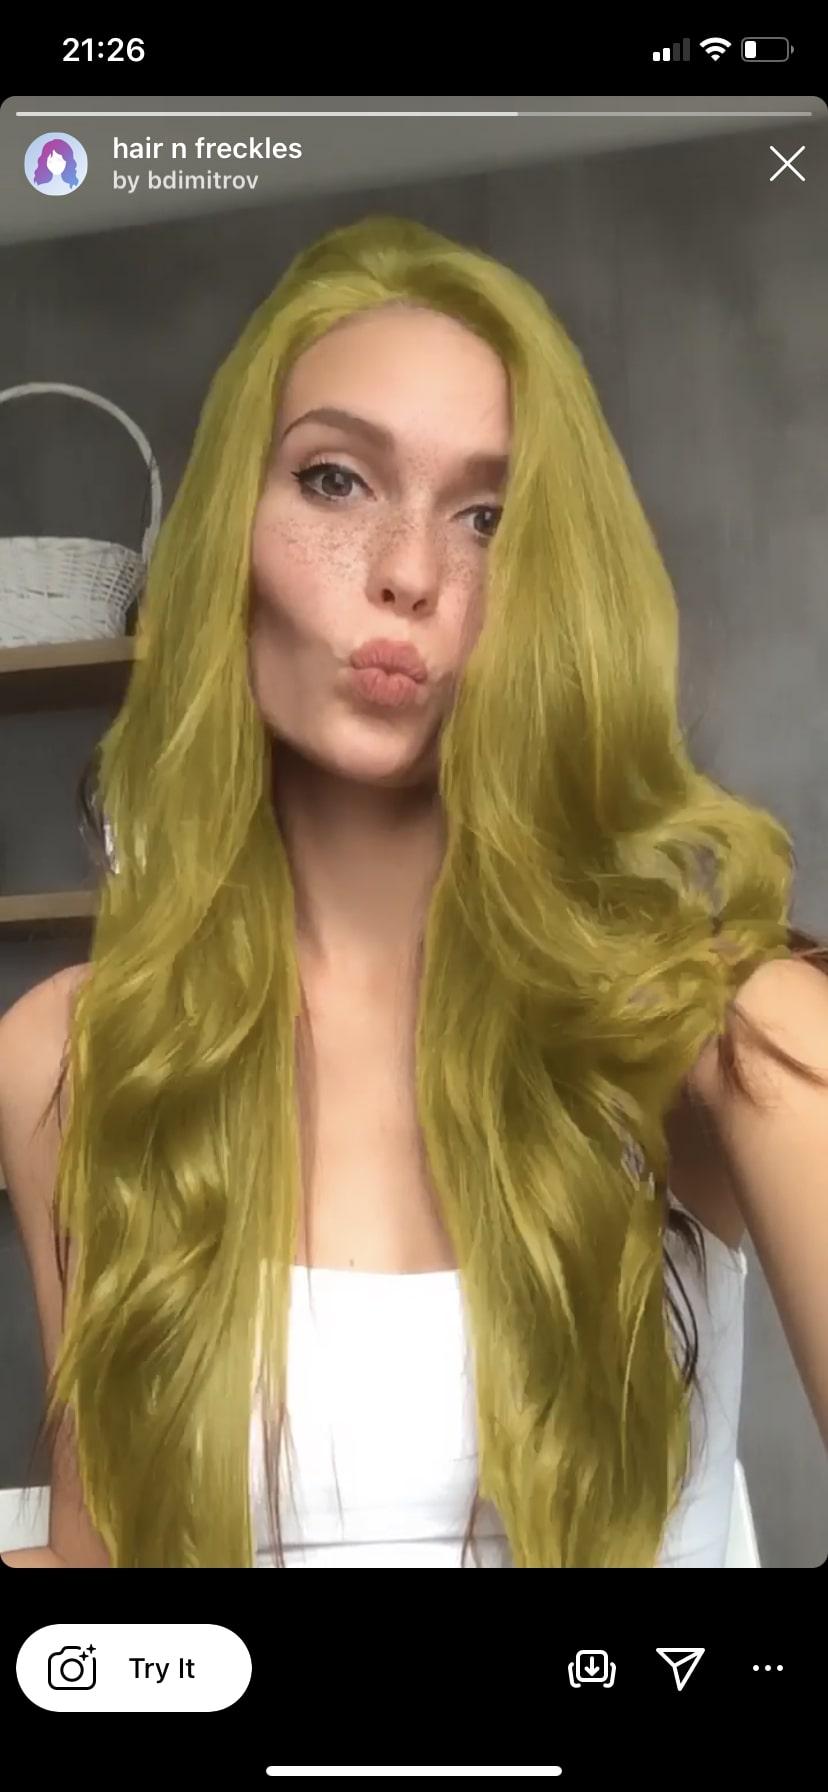 hair n freckles by @bdimitrov hair color Instagram filter